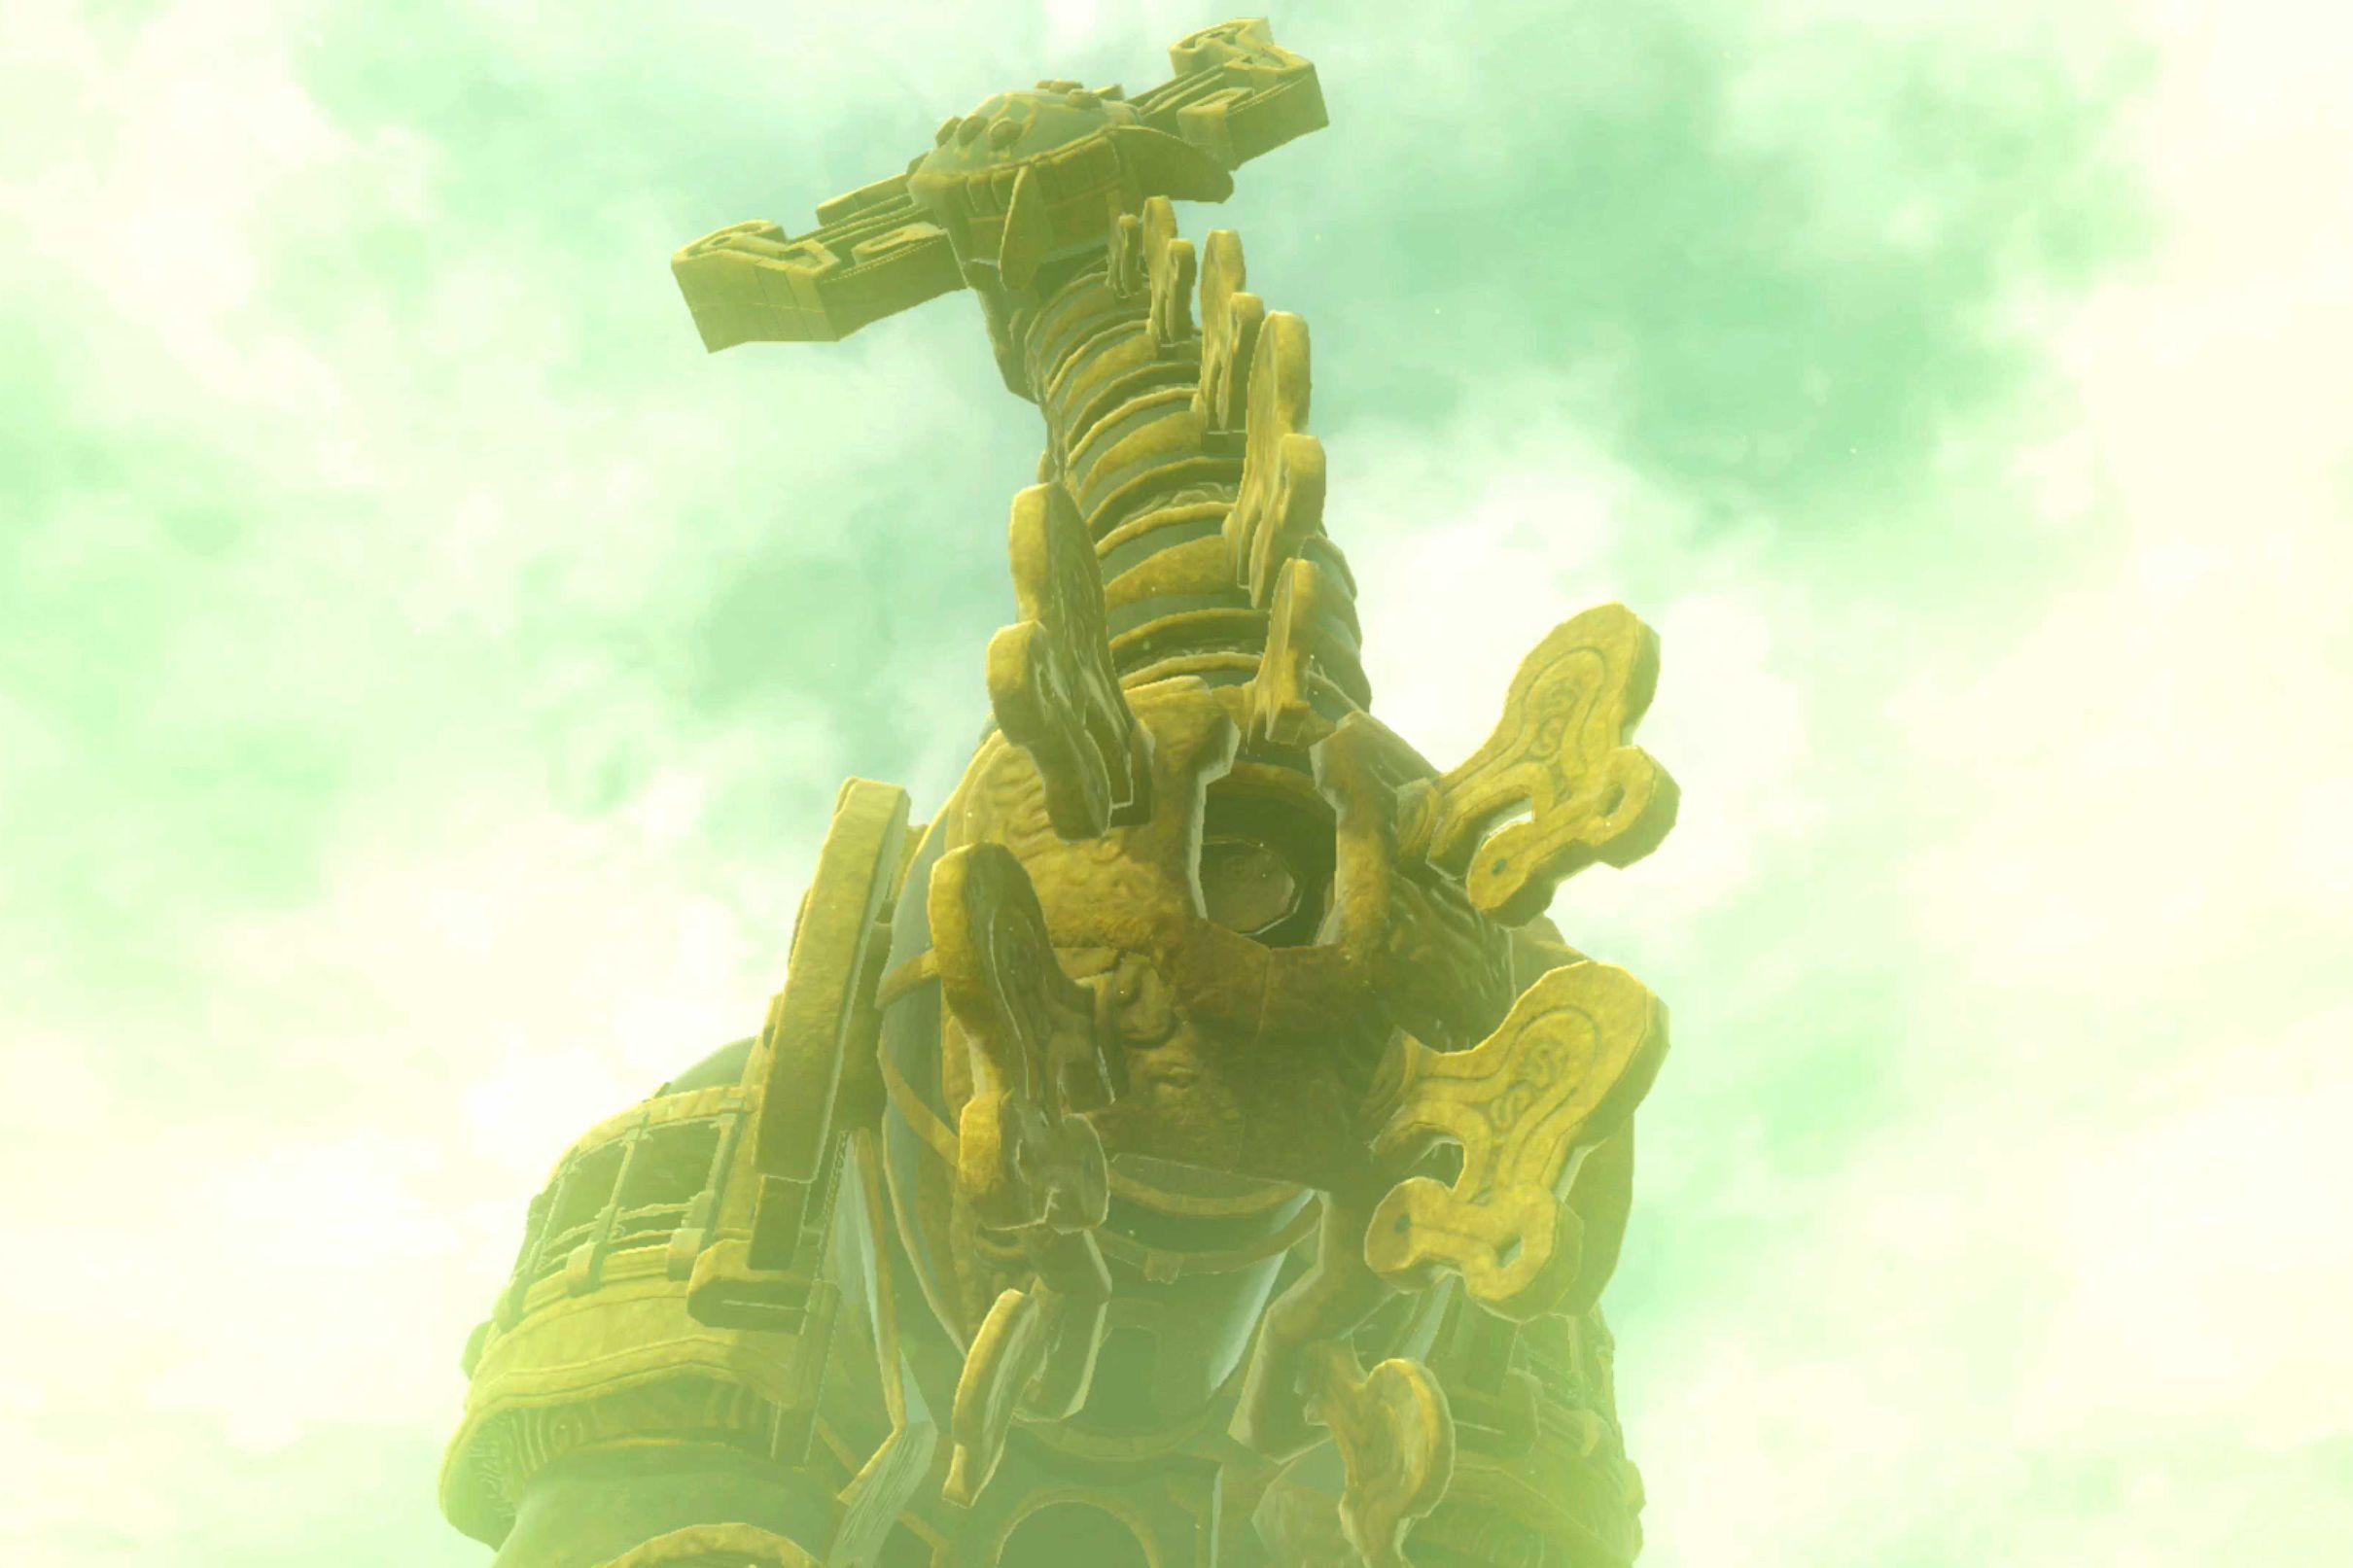 Thunderblight Ganon Boss Fight Zelda Breath Of Wild